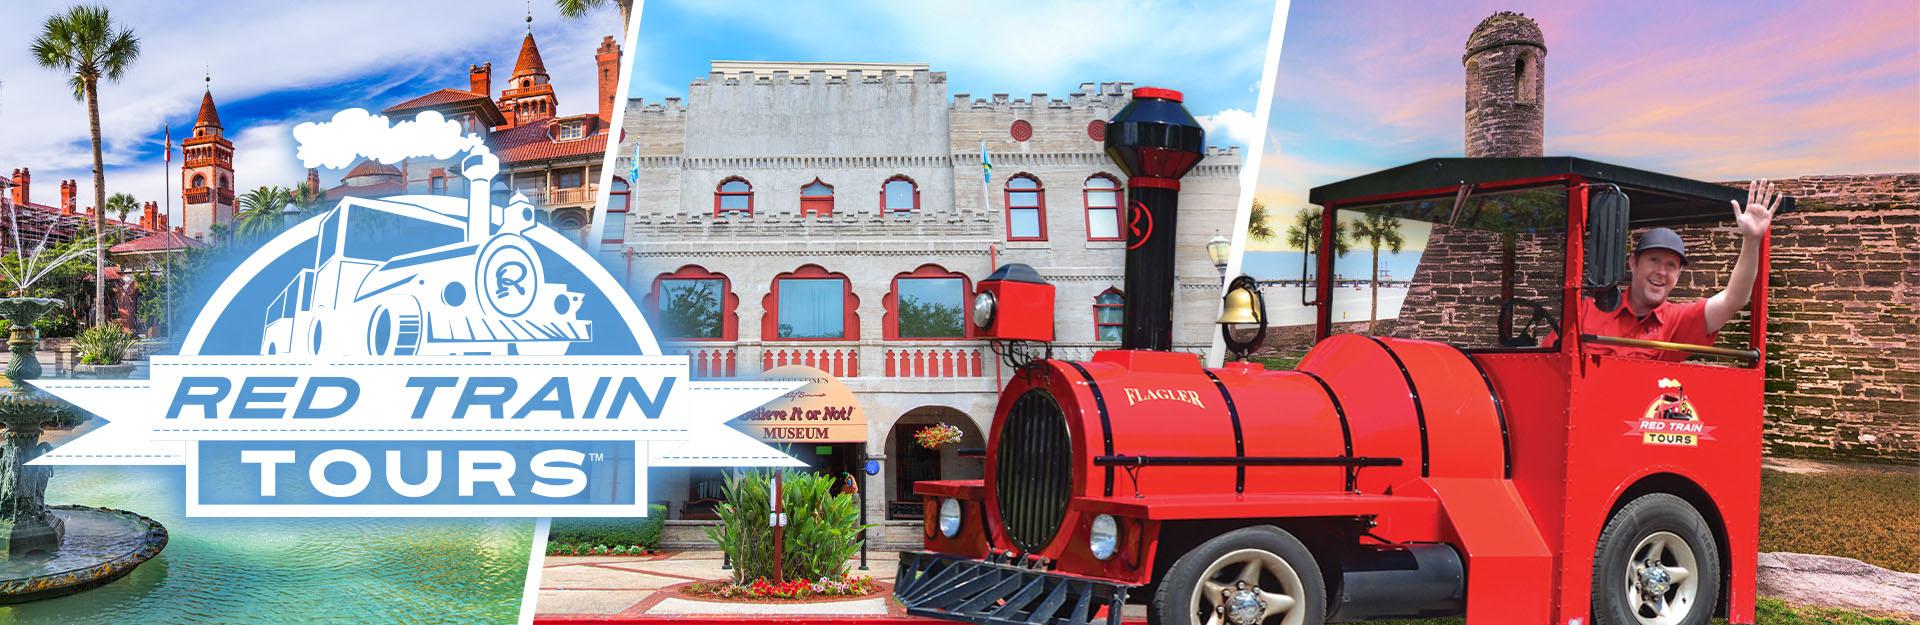 Red Train Header Image